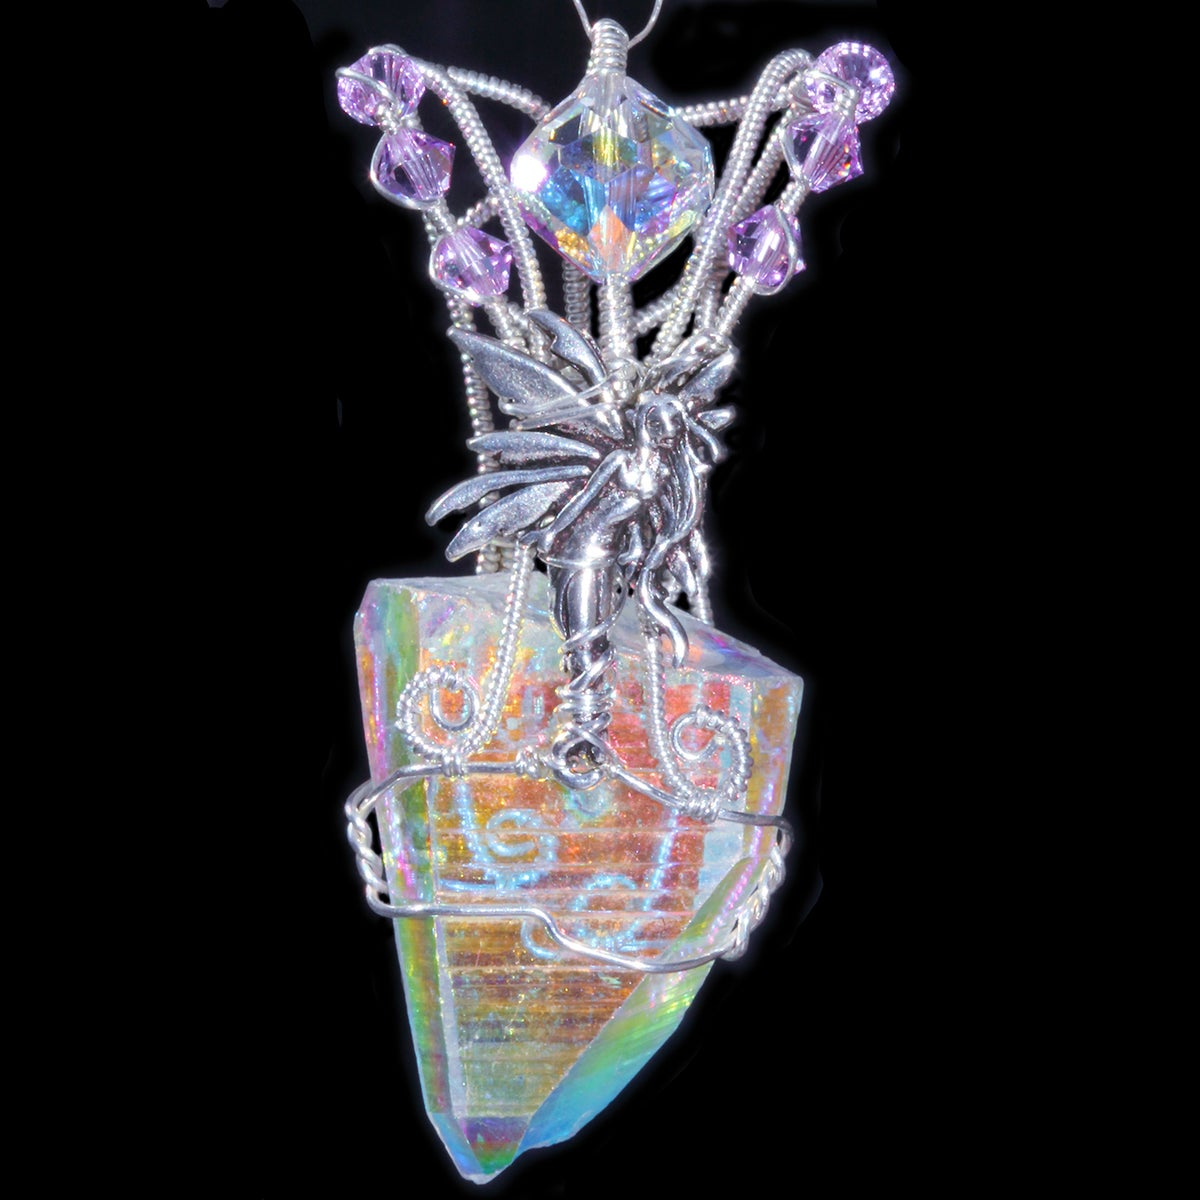 Angel Aura Quartz Crystal Handmade Pendant with Pixie Fairy